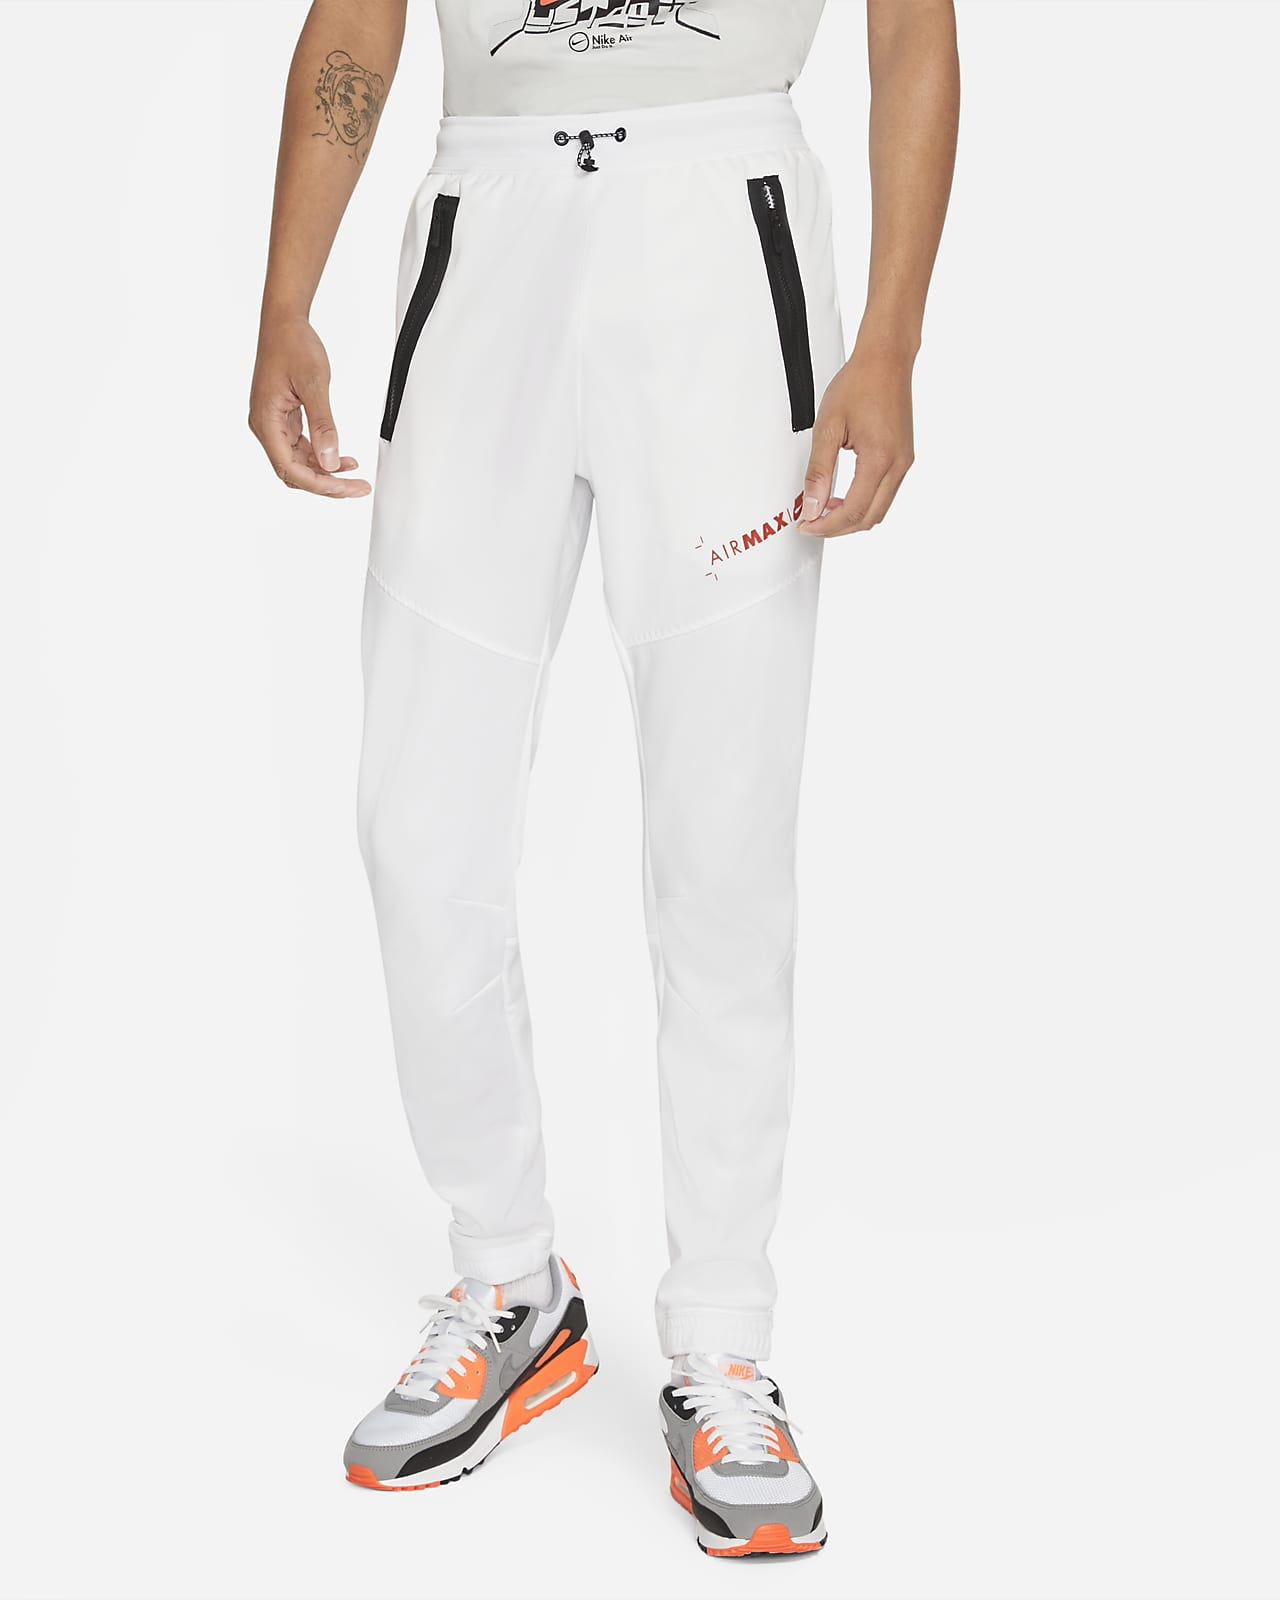 Nike Sportswear Air Max Men's Fleece Trousers. Nike LU